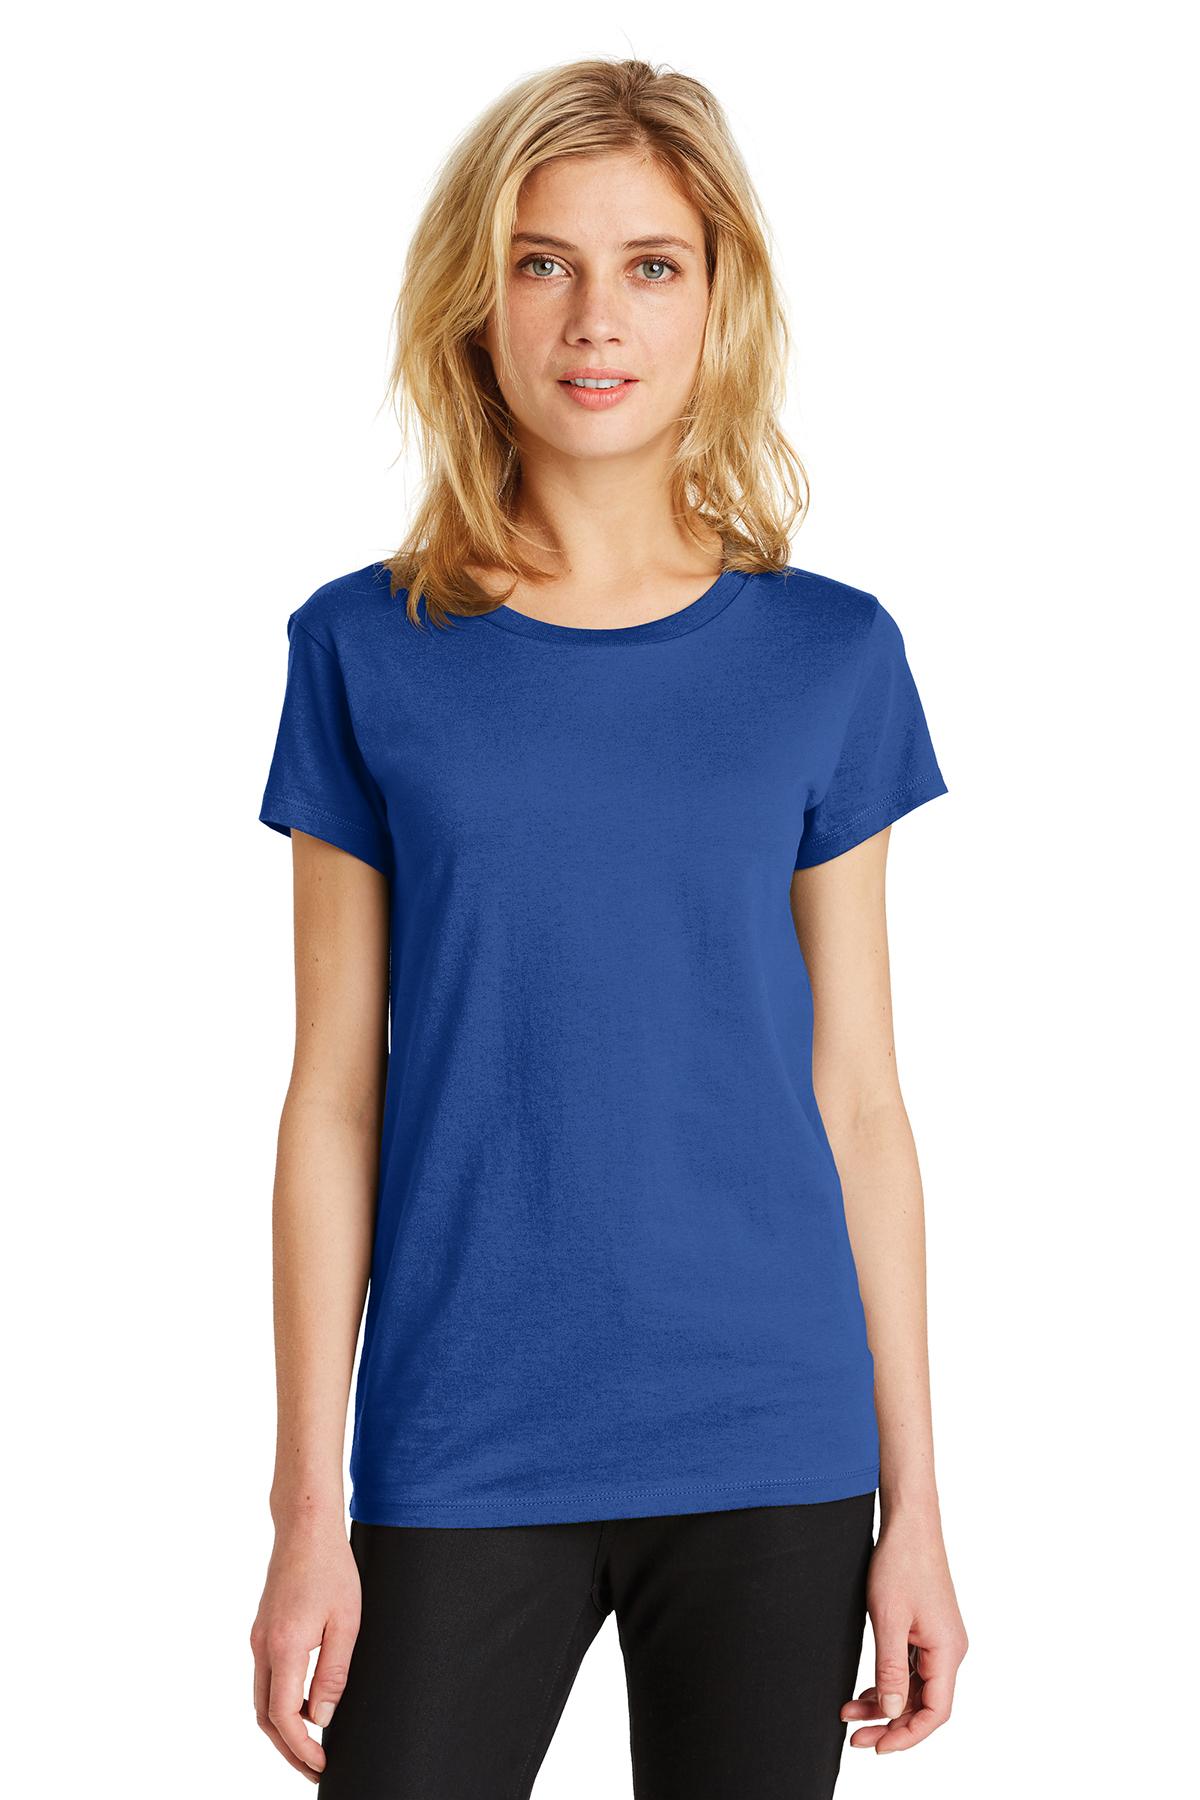 54bf47f57434 Alternative Women's Legacy Crew T-Shirt | Ring Spun | T-Shirts ...